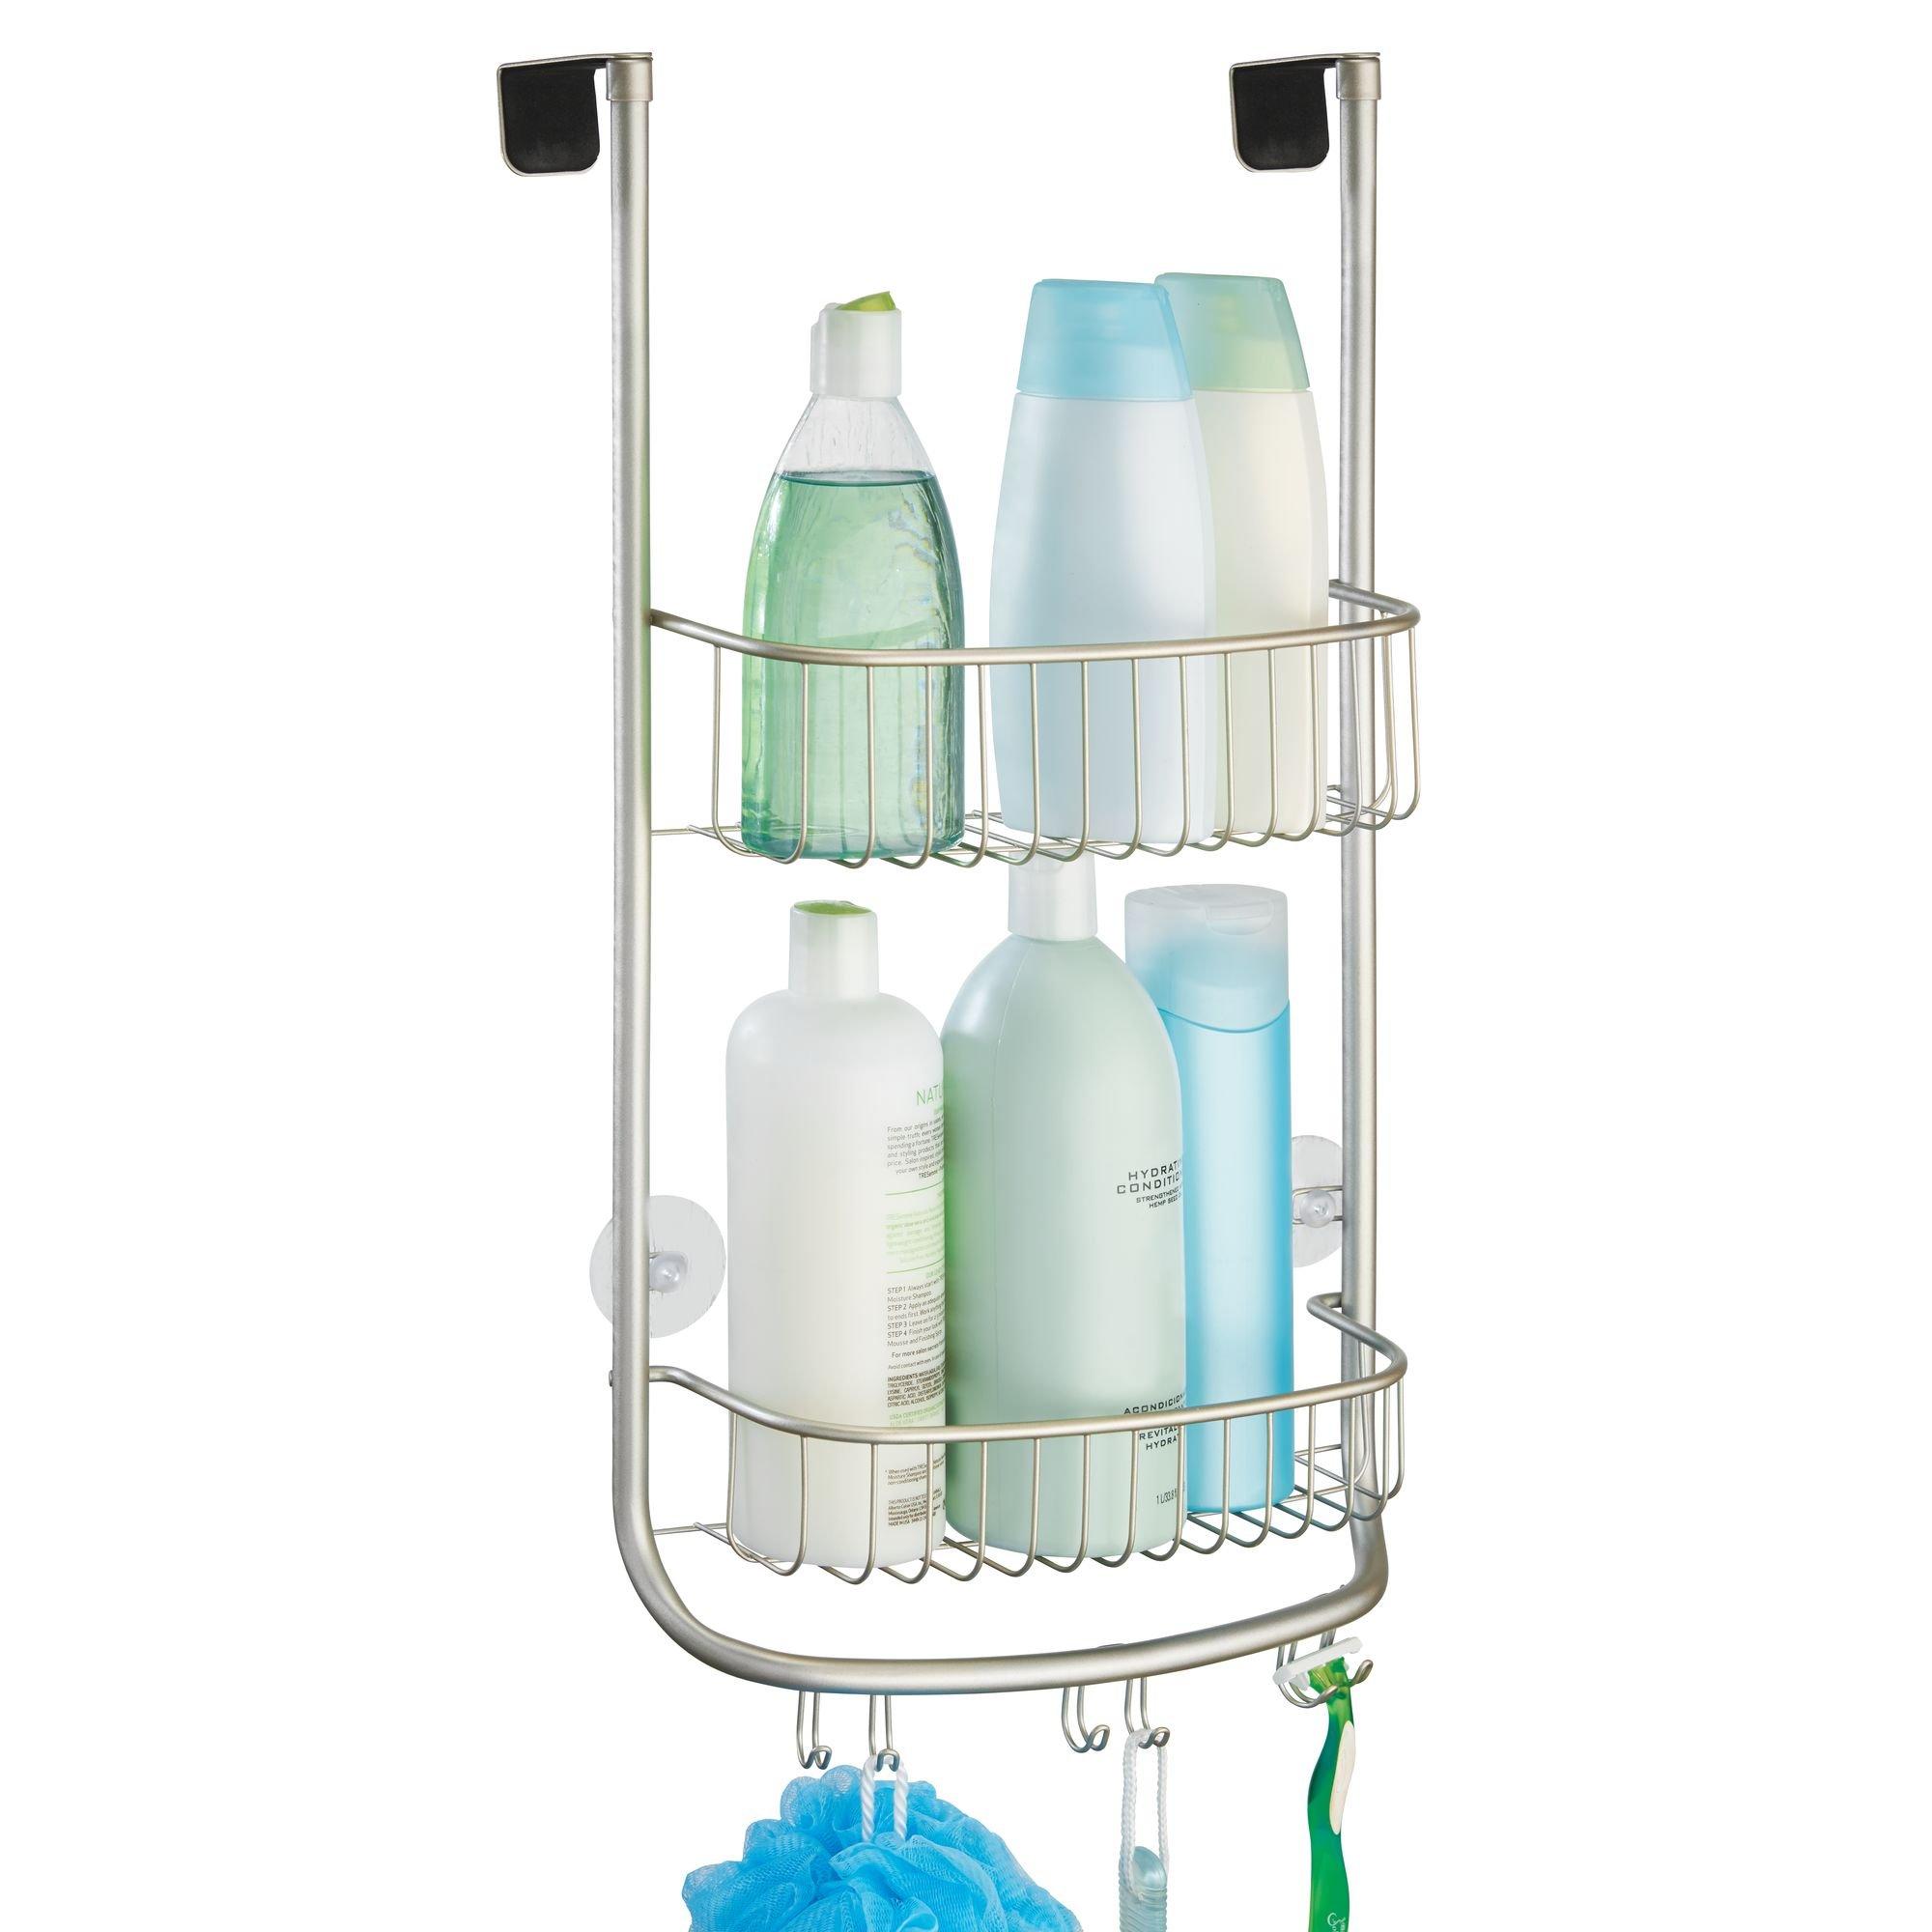 InterDesign Forma Over Door Shower Caddy – Bathroom Storage Shelves for Shampoo, Conditioner and Soap, Satin